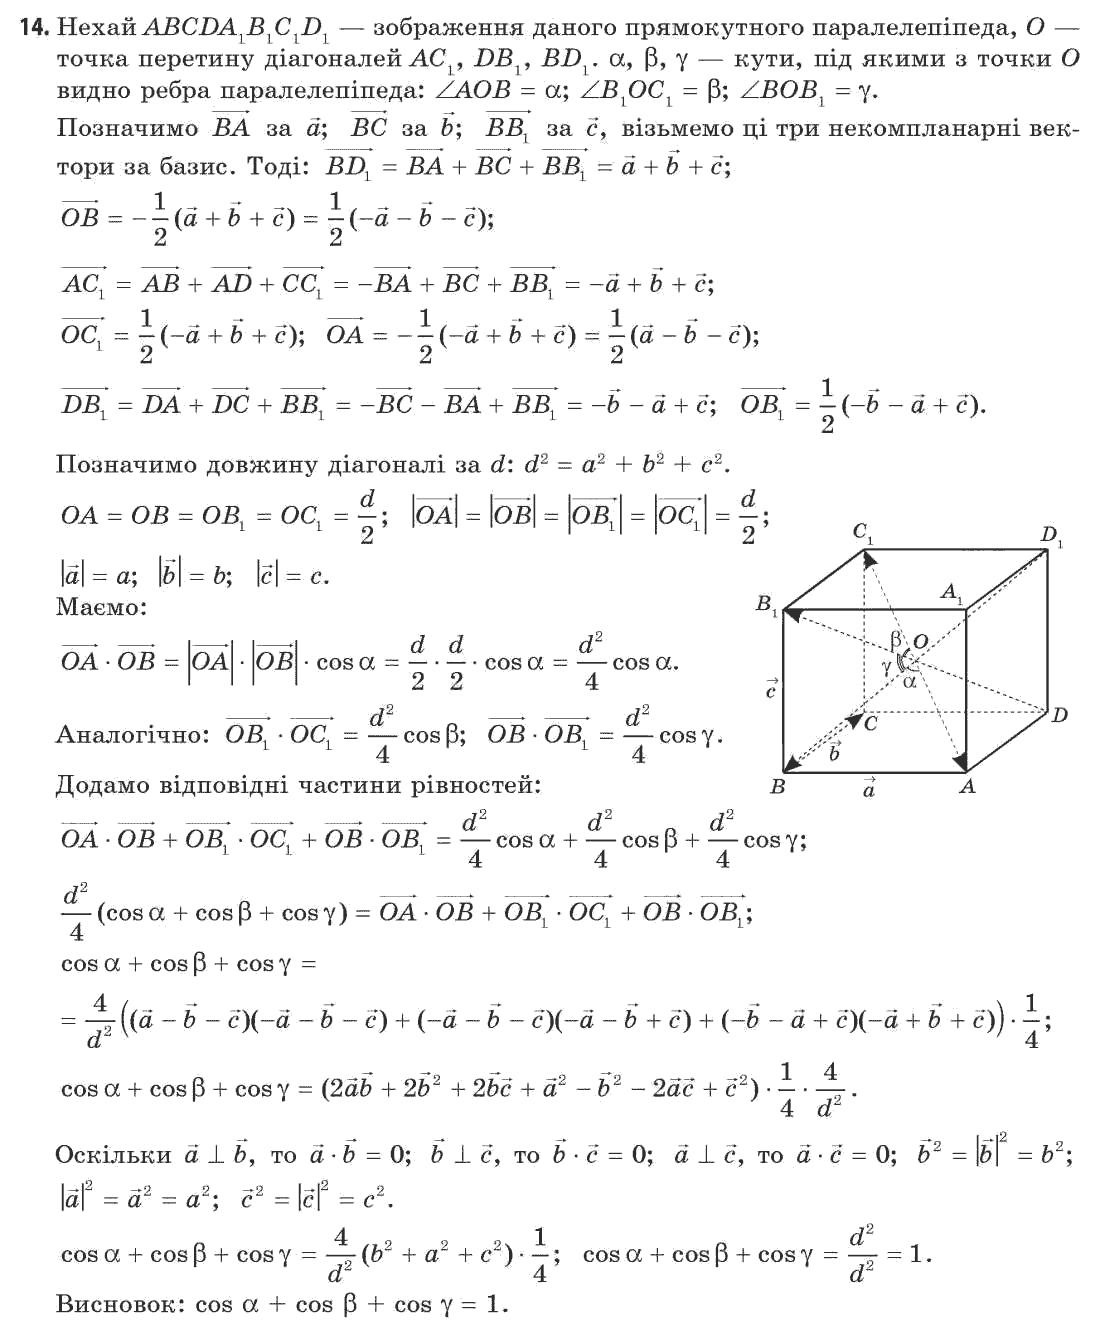 Решебник апостолова геометрия 11 класс все гдз.